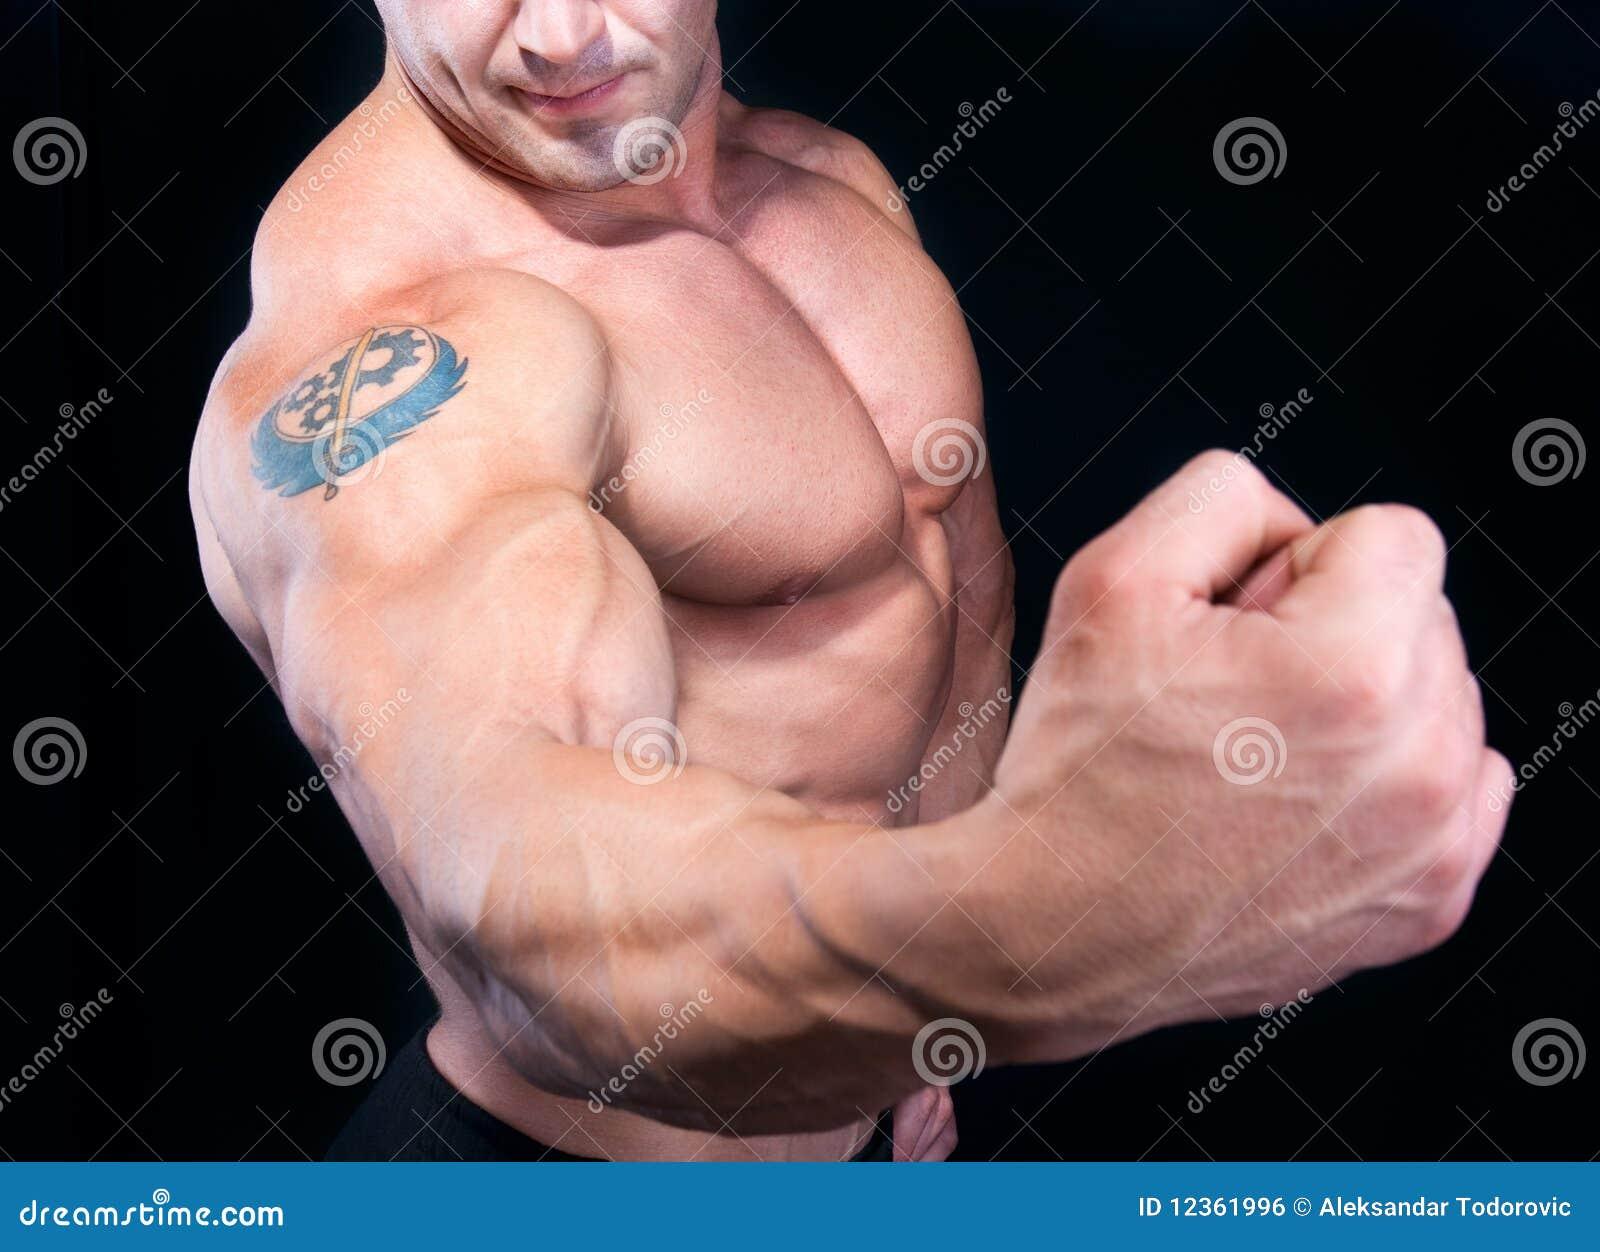 free male on male gangbang